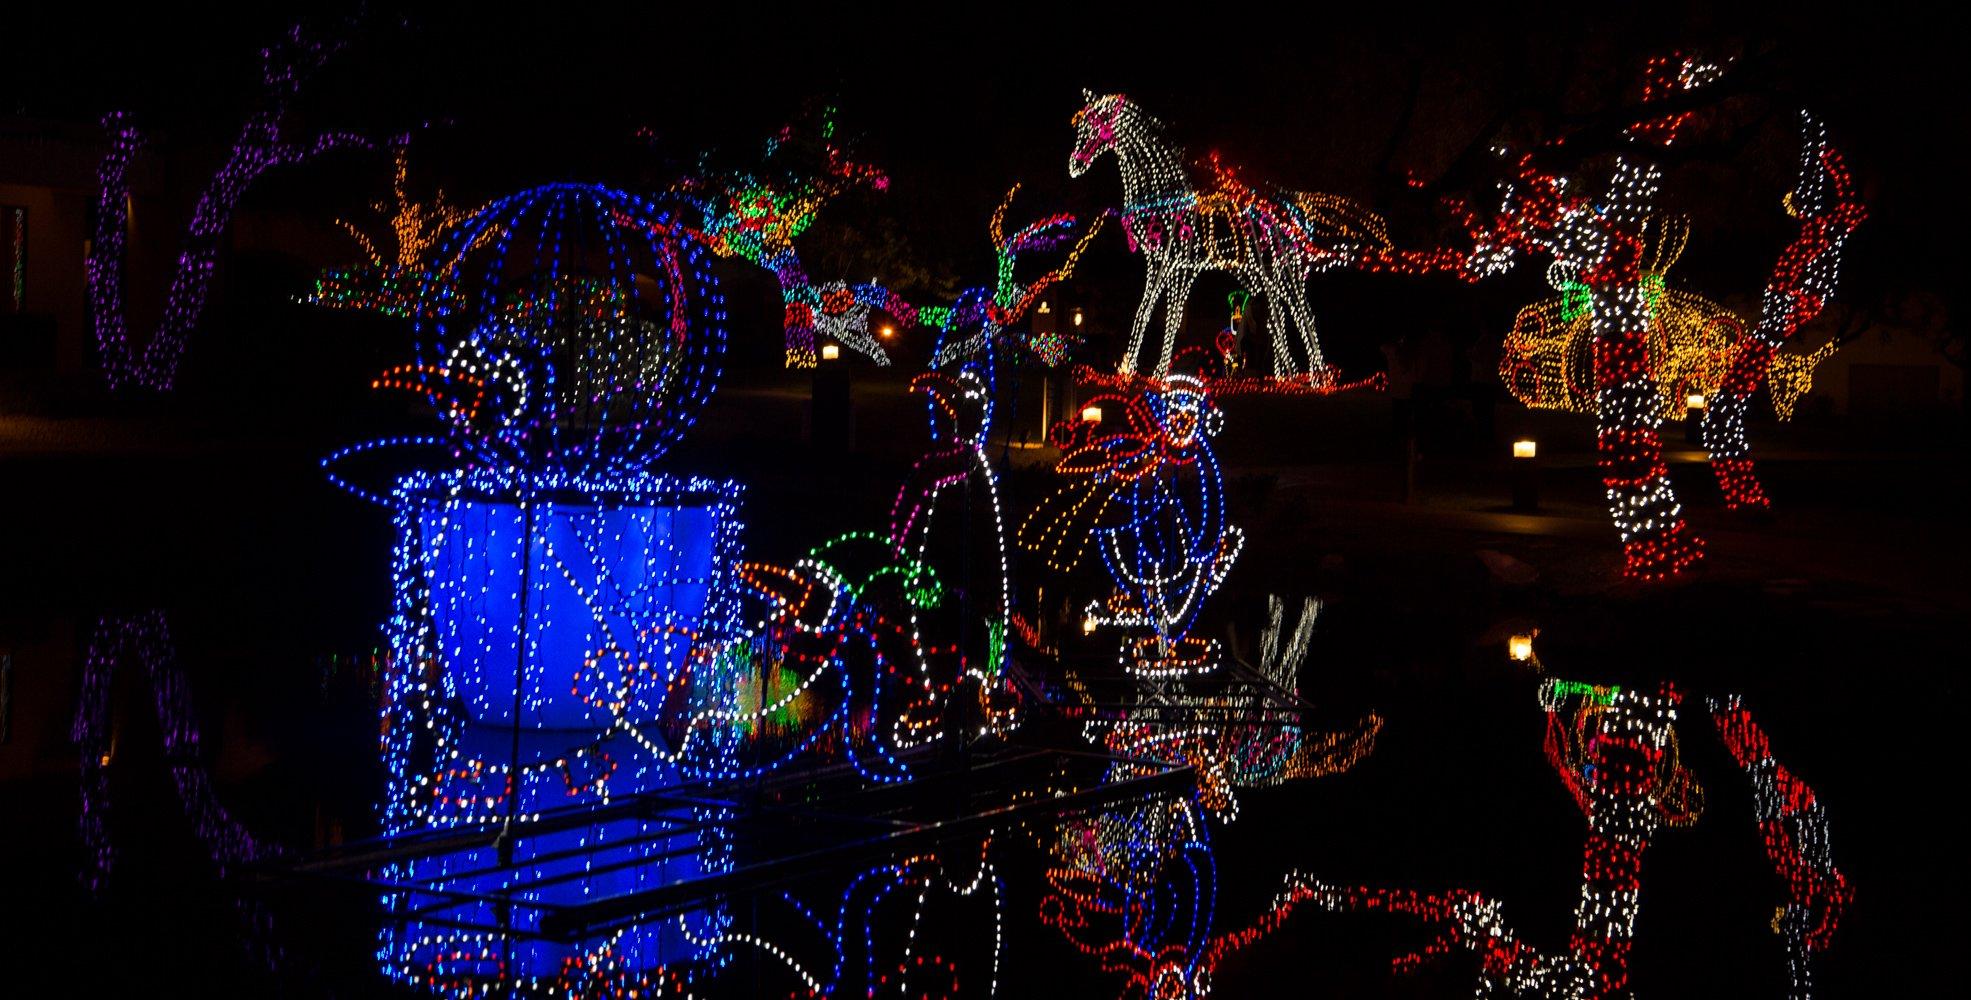 fairmont_scottsdale_princess_at_christmas_time-15